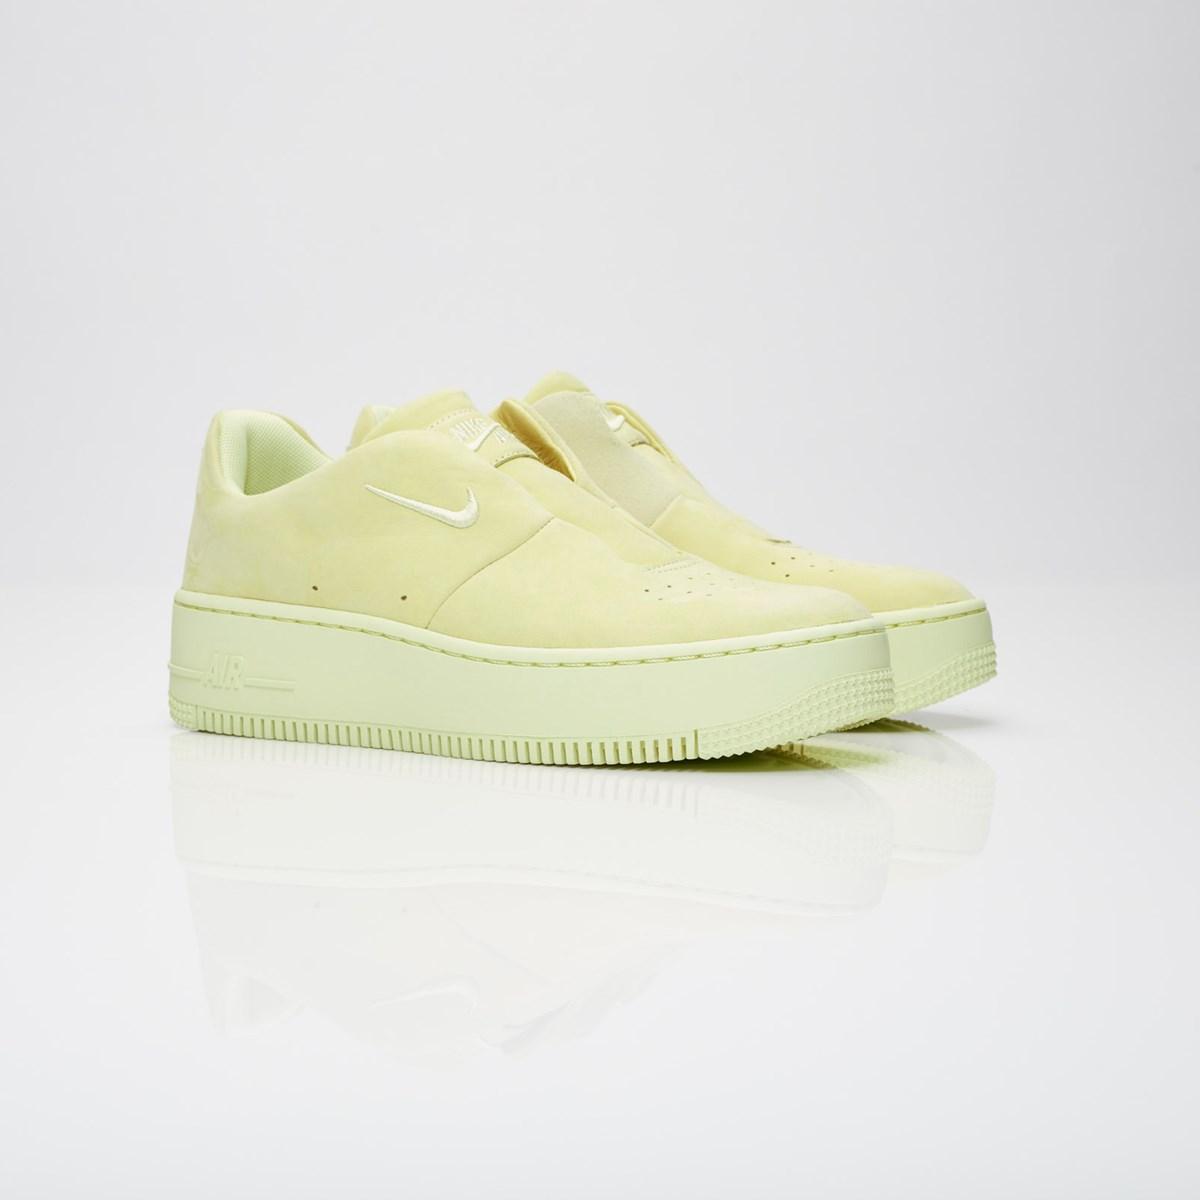 info for 4440c 95ddd nike wmns air force 1 sage xx ao1215 300 sneakers   streetwear på nätet sen  1999